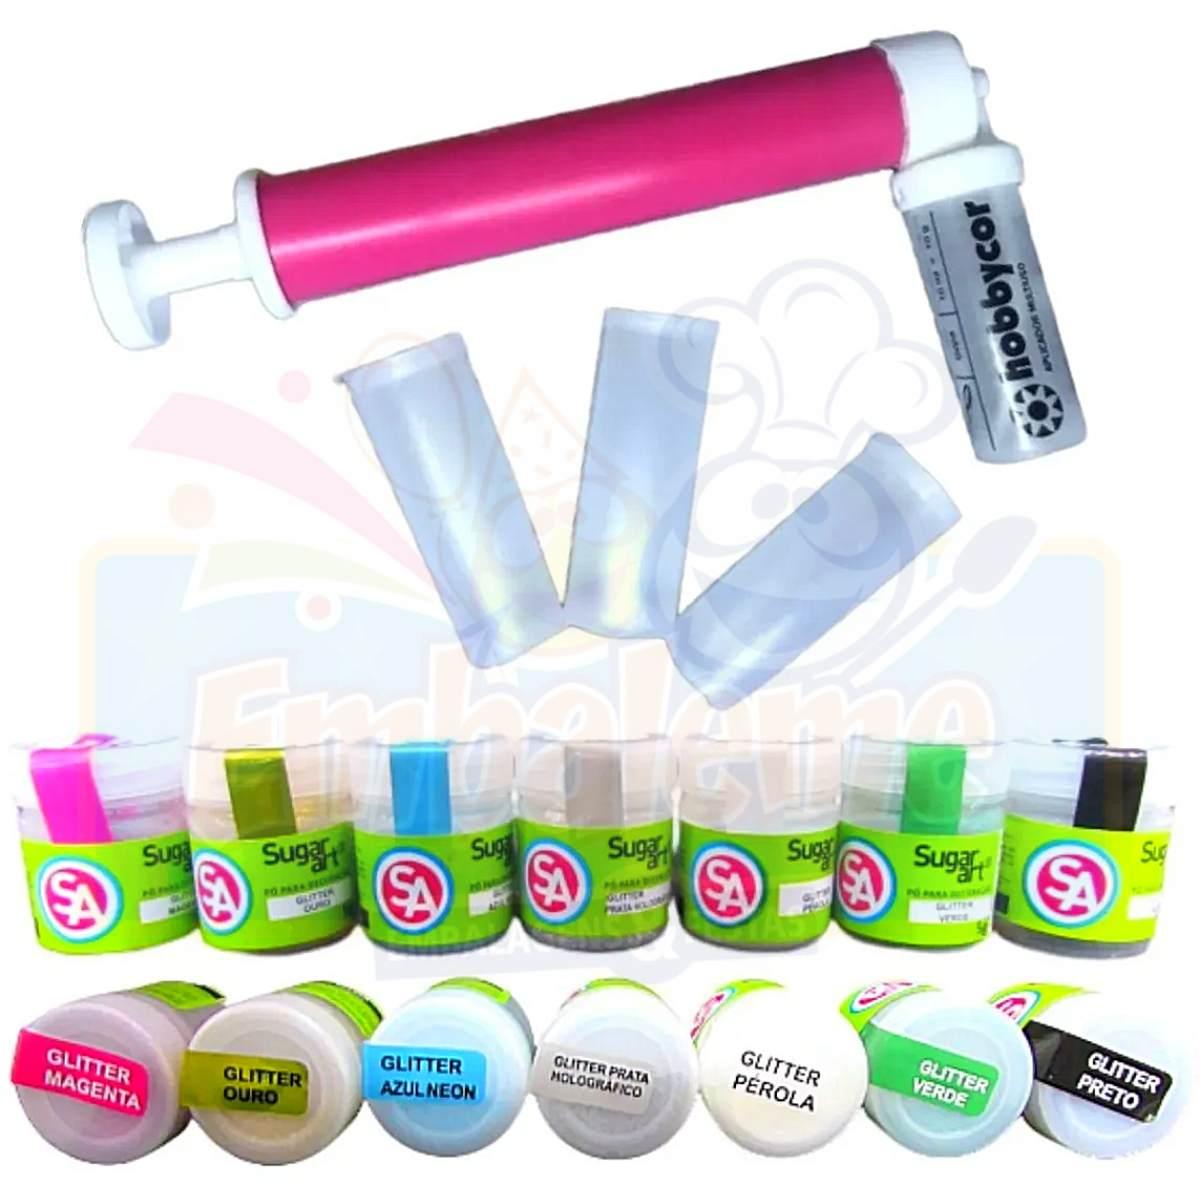 Kit 7 Glitter Comestível para Bolo Sugar art + Bombinha Para Glitter